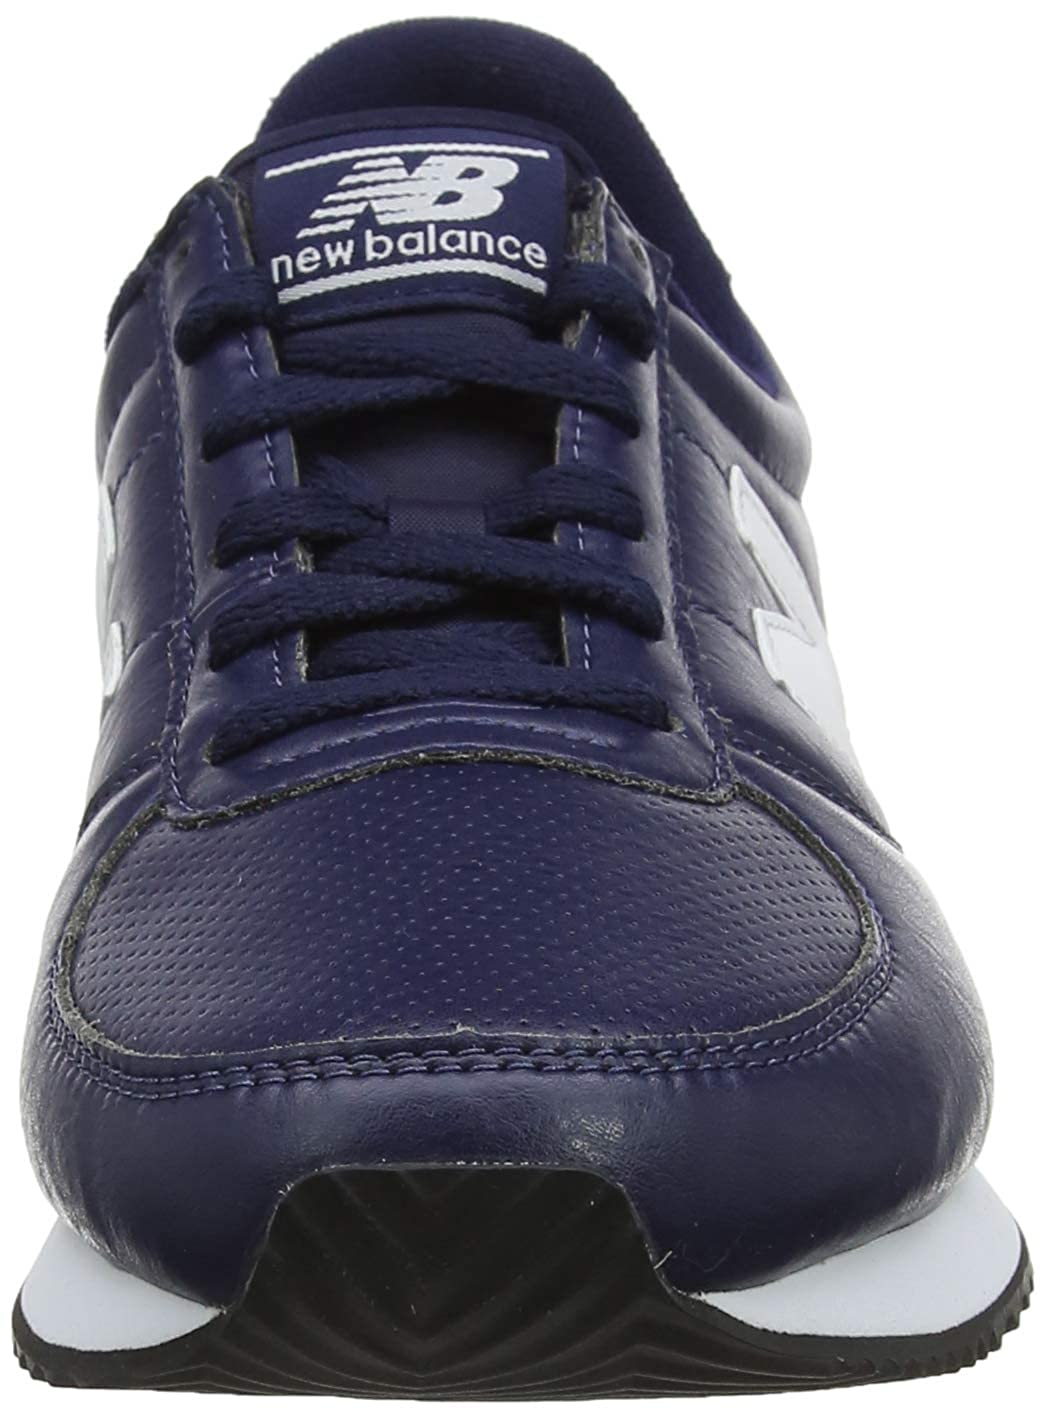 New Balance Herren 220 Turnschuhe    cdd566